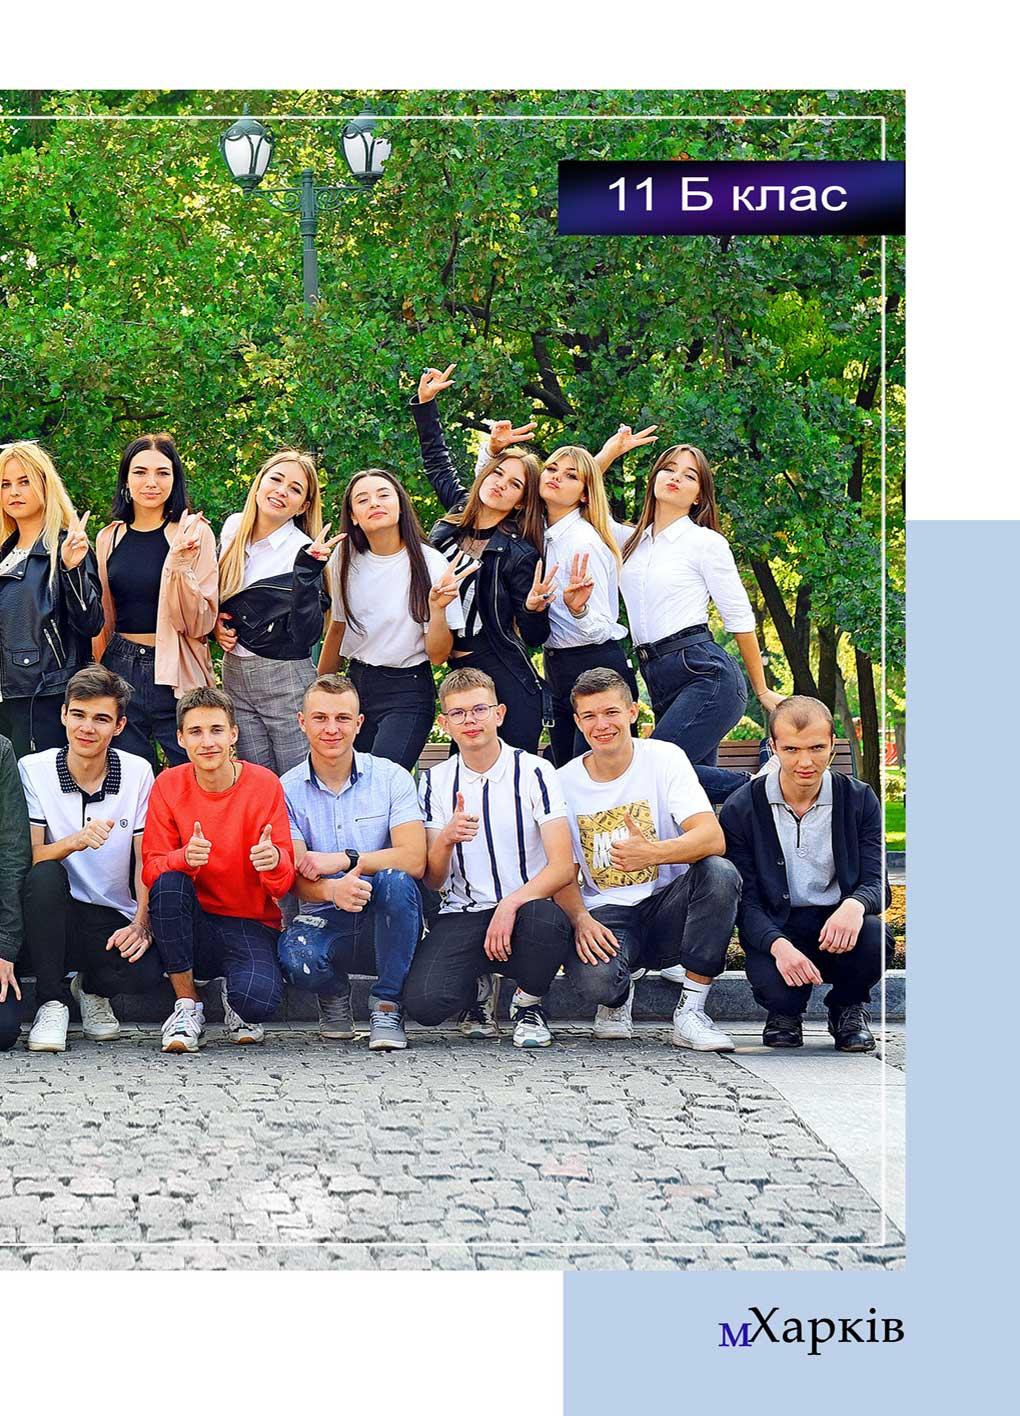 https://school-photo.com.ua/wp-content/uploads/2021/09/8_02-1.jpg